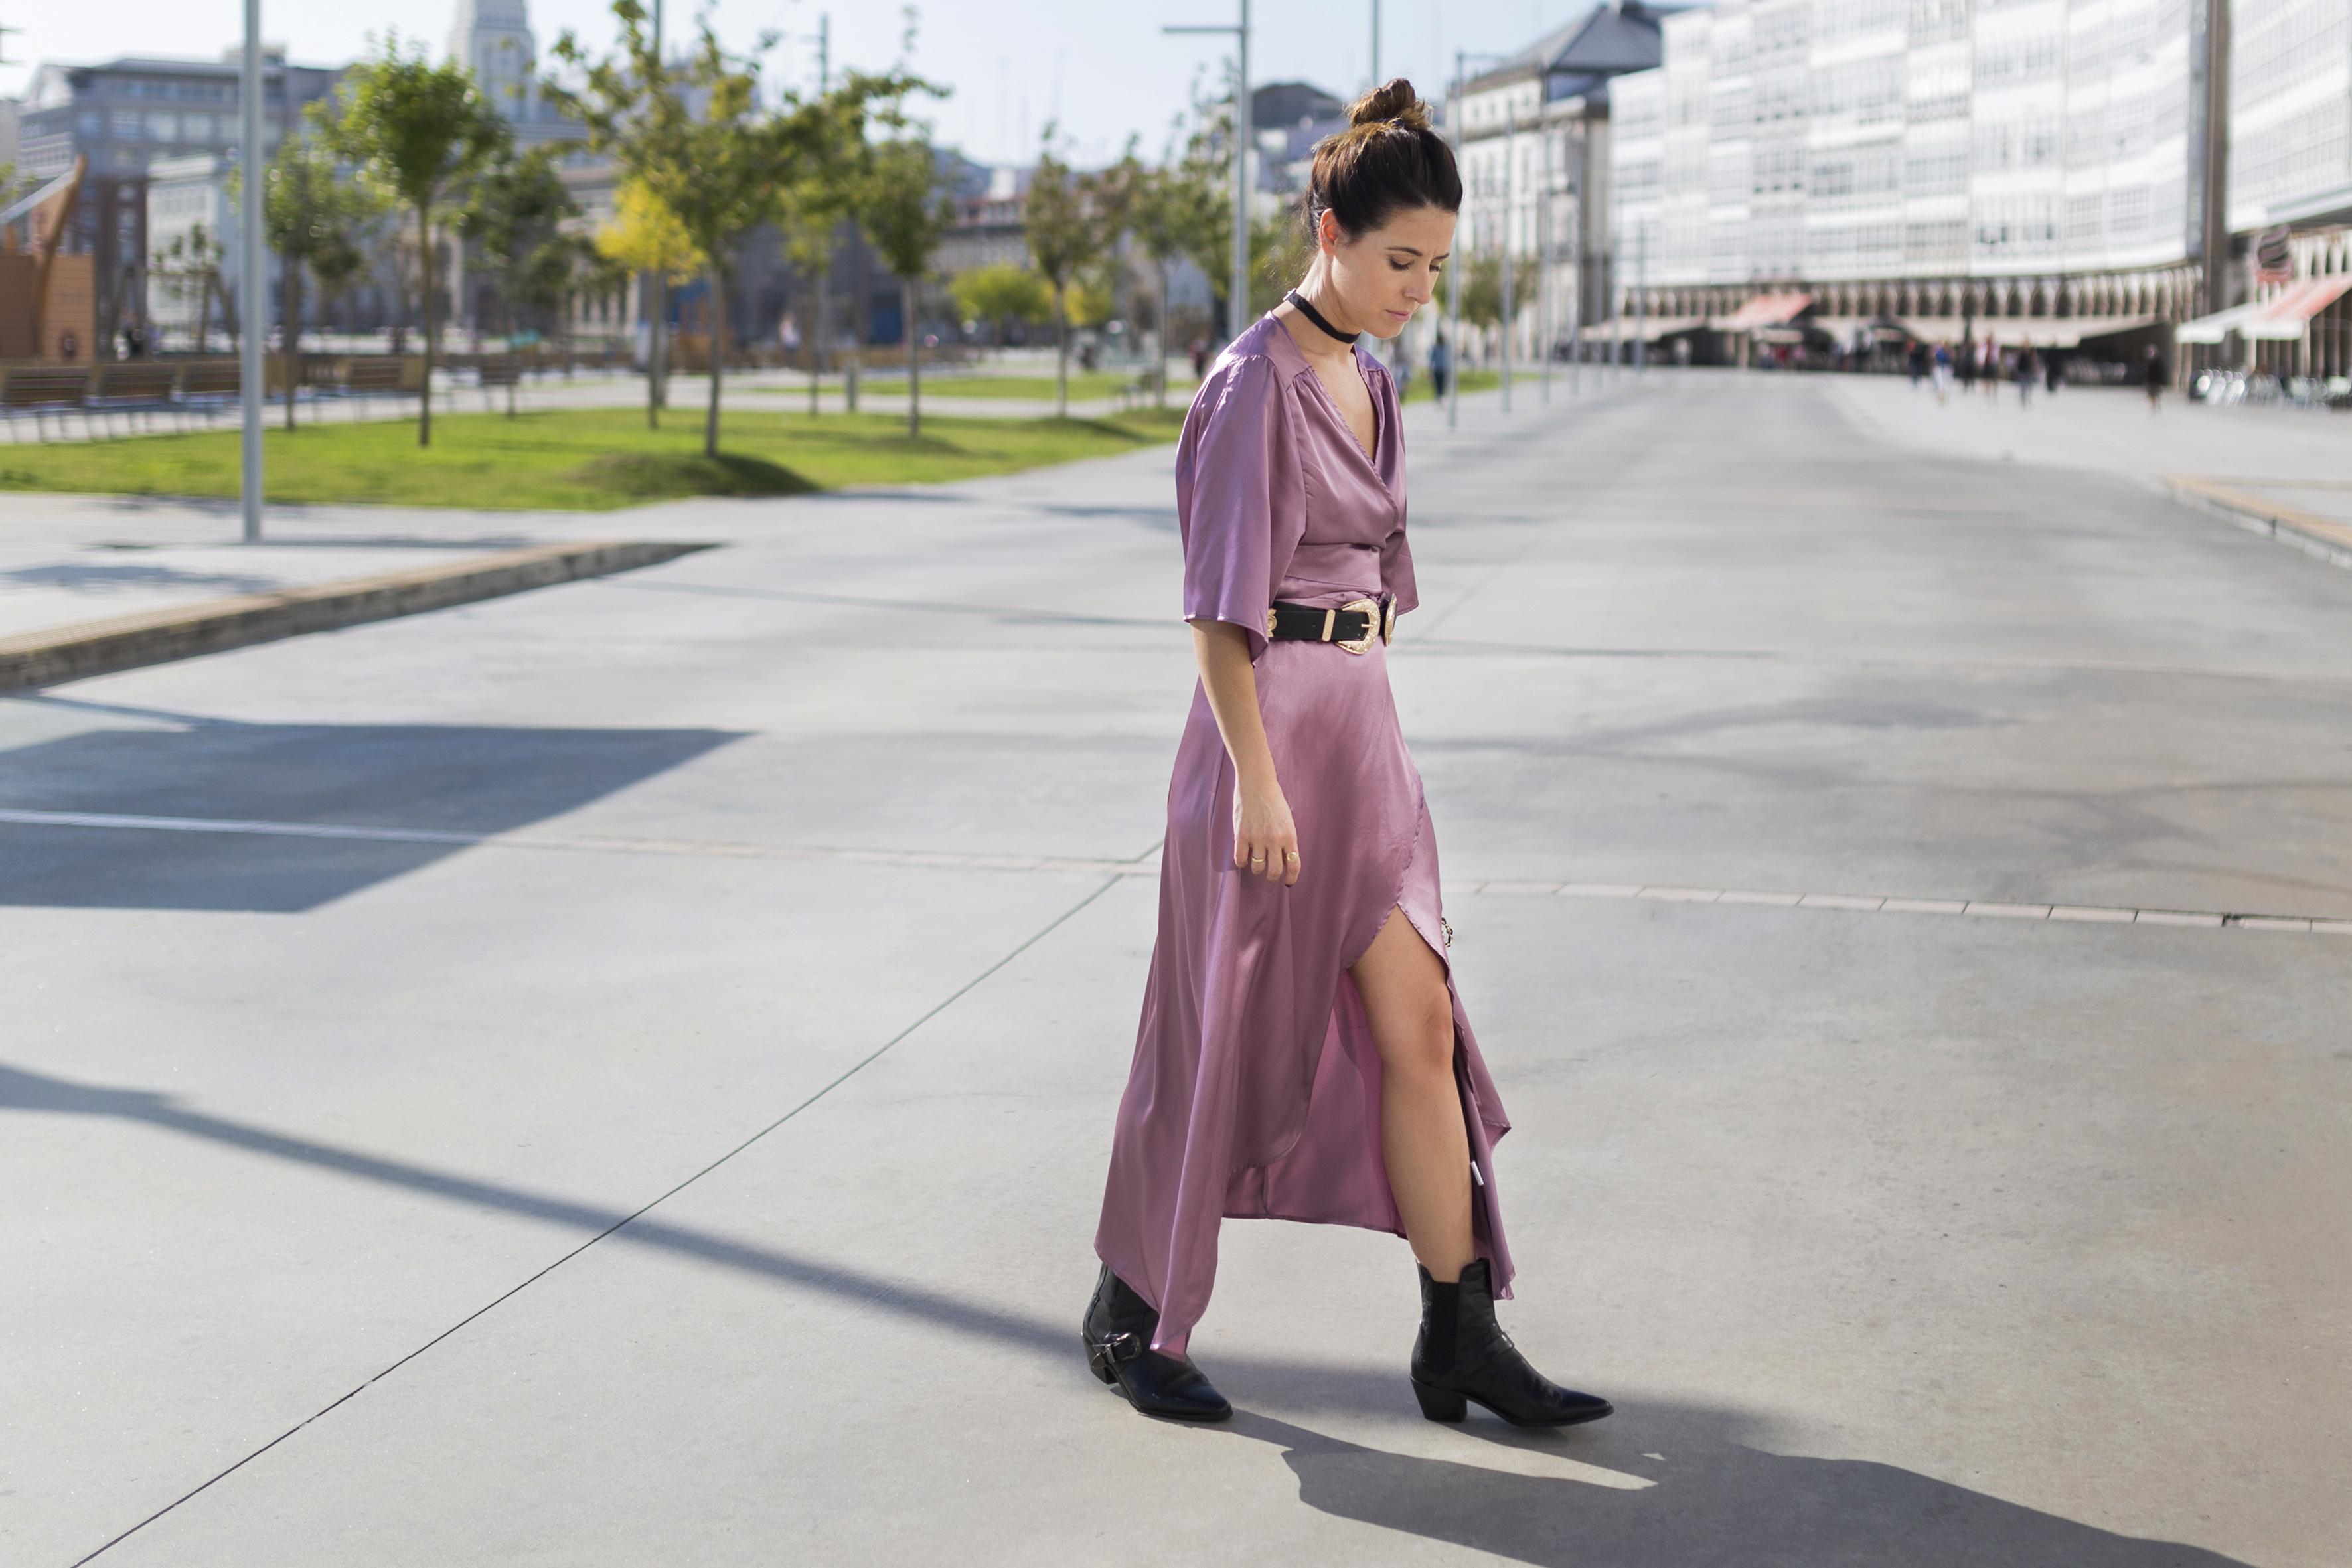 StyleLovely-blogger- alba cuesta- vestido satinado - descalzaporelparque-choker zara - SHEIN - ootd - galicia - fashion -blogger - style - moda calle - streetstyle - denia priegue - video - Shein dress - chanel - vintage - botines - zara